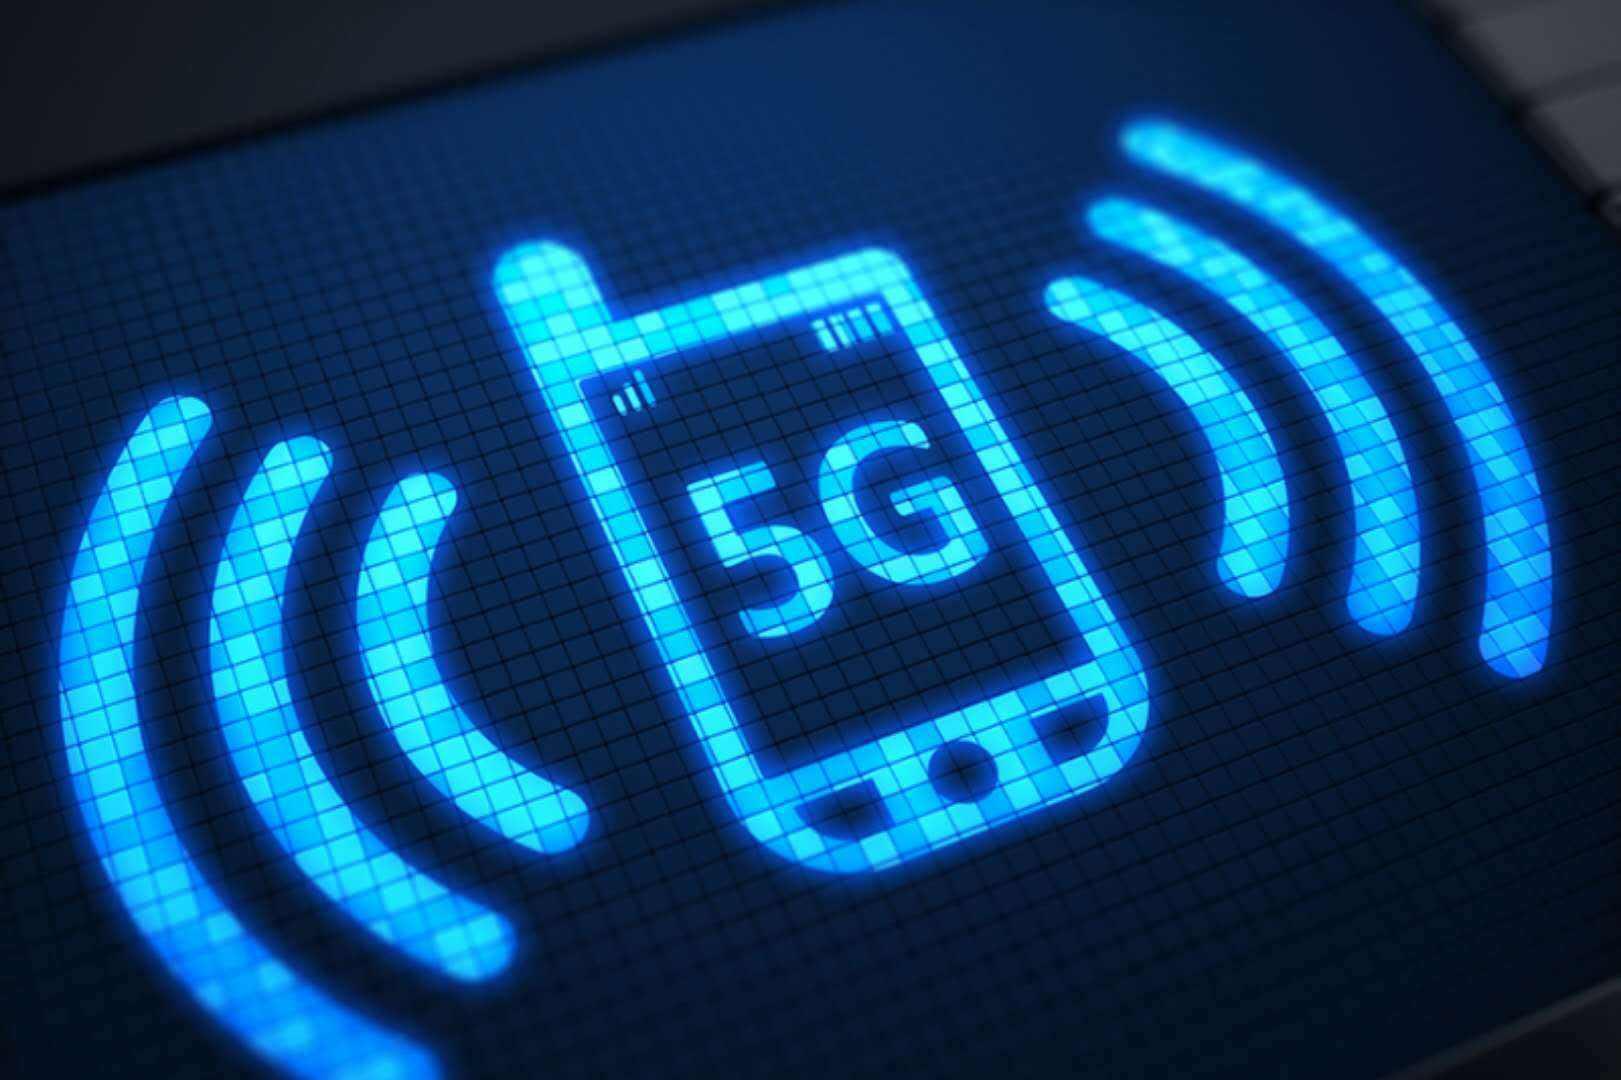 5G时代:河南开通338个5G基站 郑州地铁5号线实现5G信号全覆盖